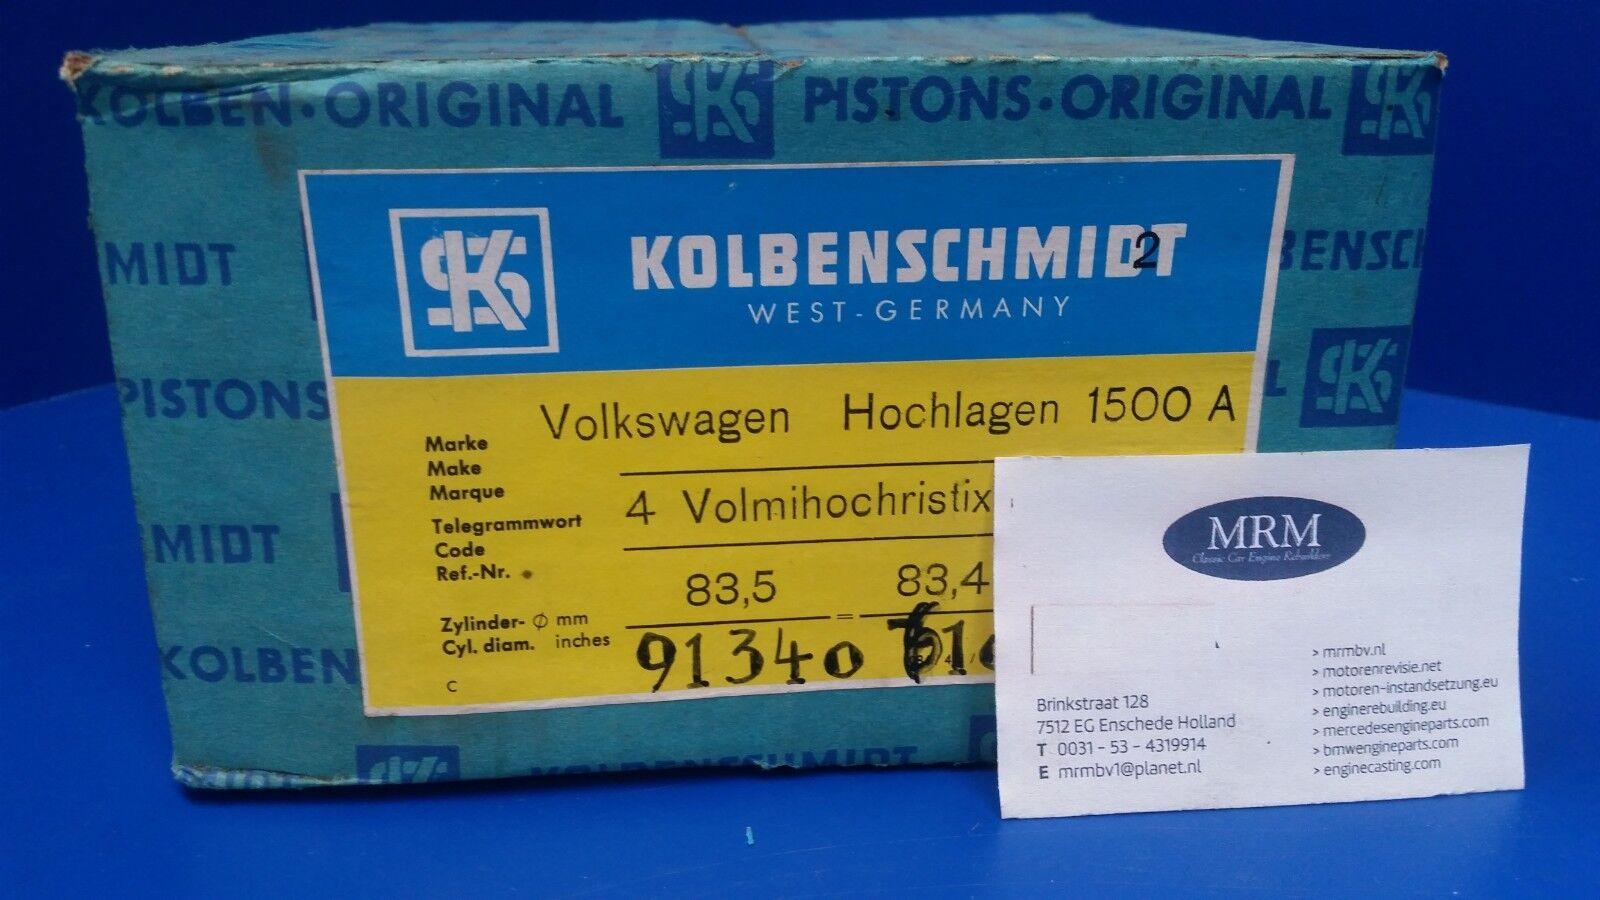 VOLKSWAGEN Motor 311 (1493cc) - 1 Piston Set KOLBENSCHMIDT (4Pcs) Size 83.5mm